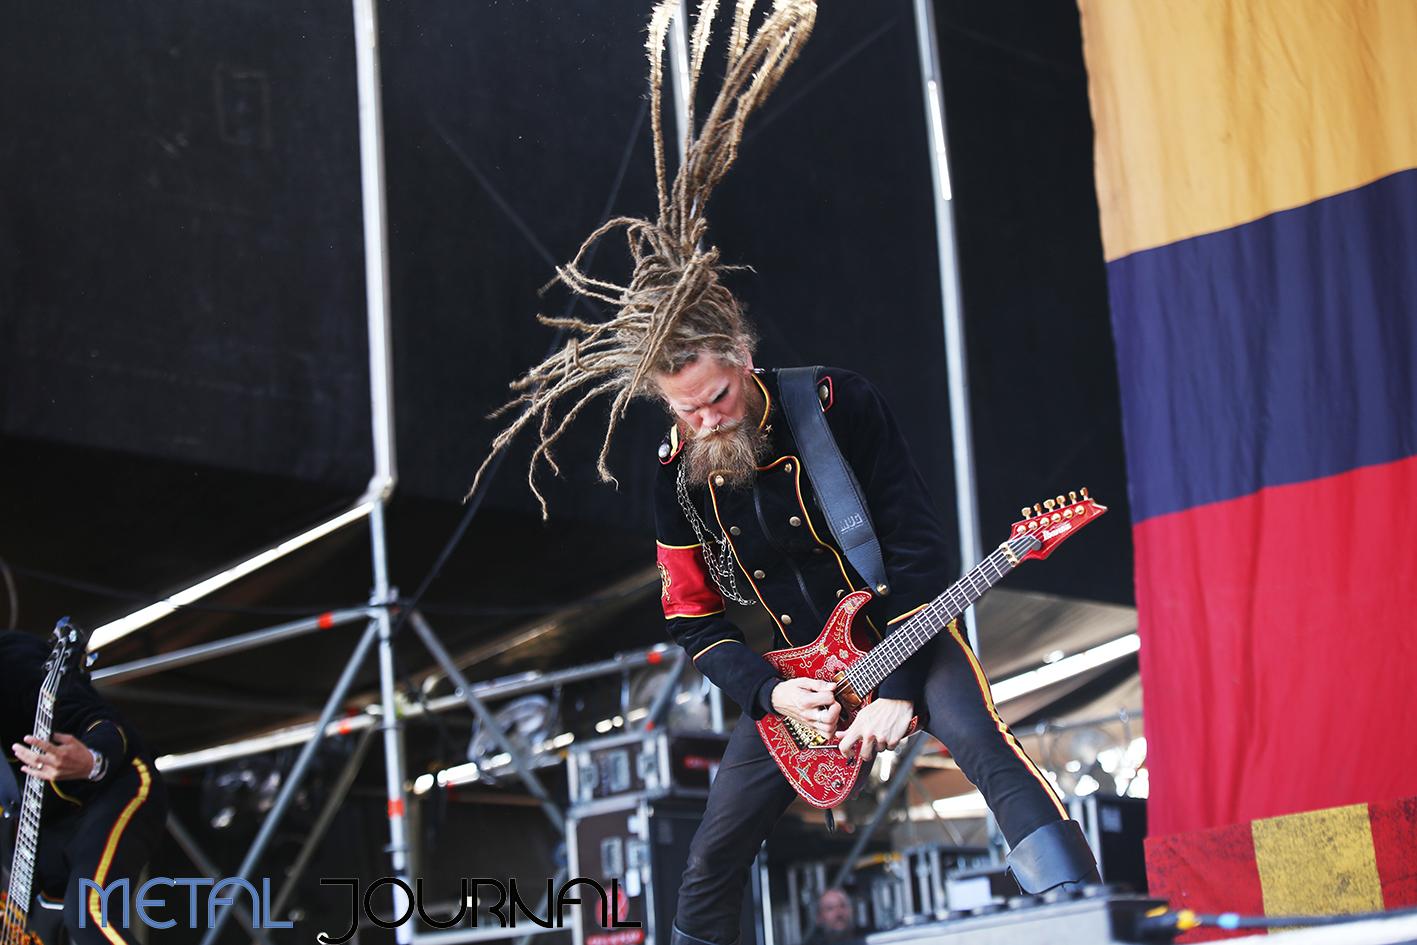 avatar - leyendas del rock 2019 metal journal pic 5